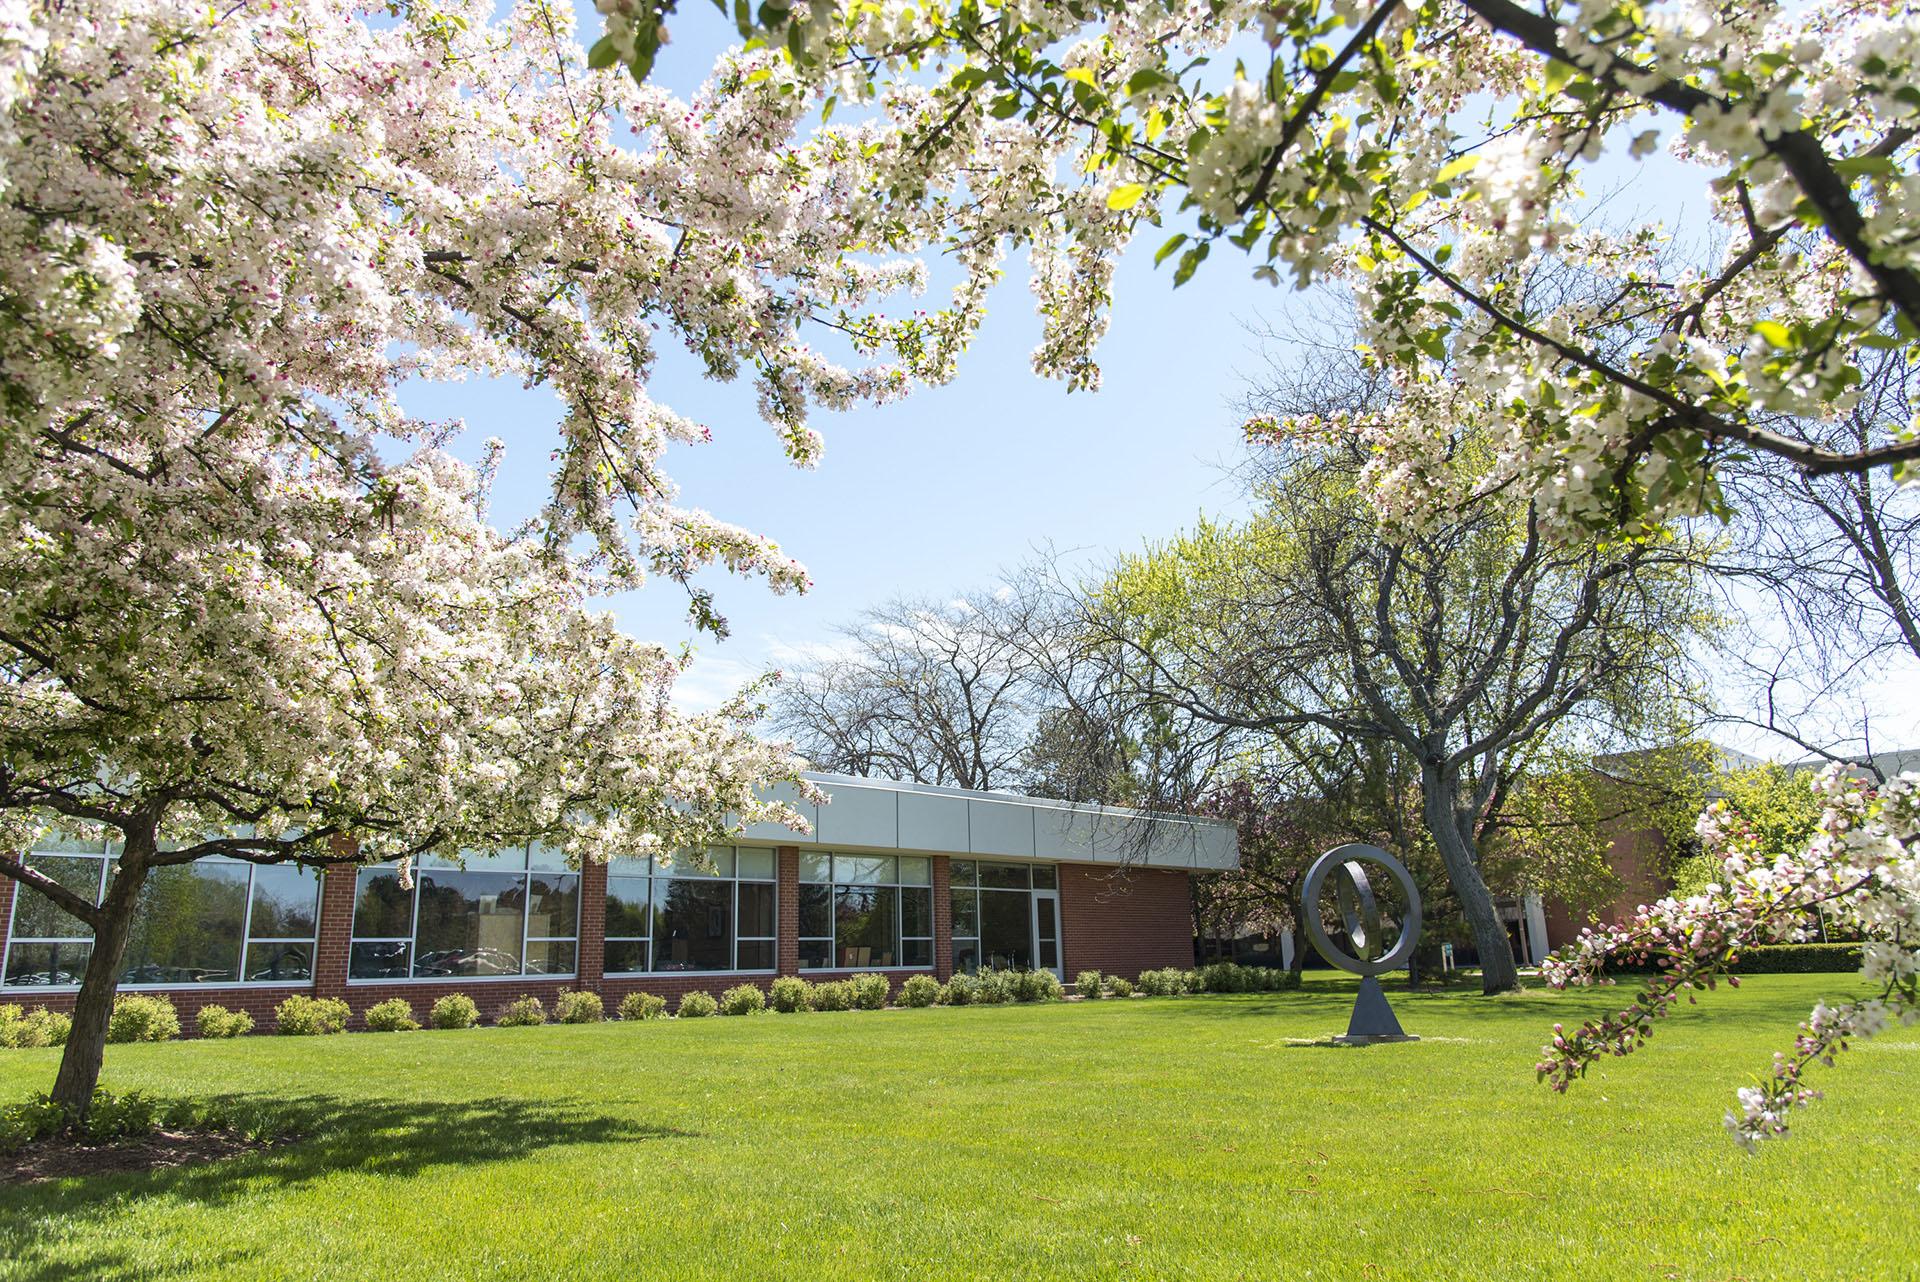 Main campus in spring